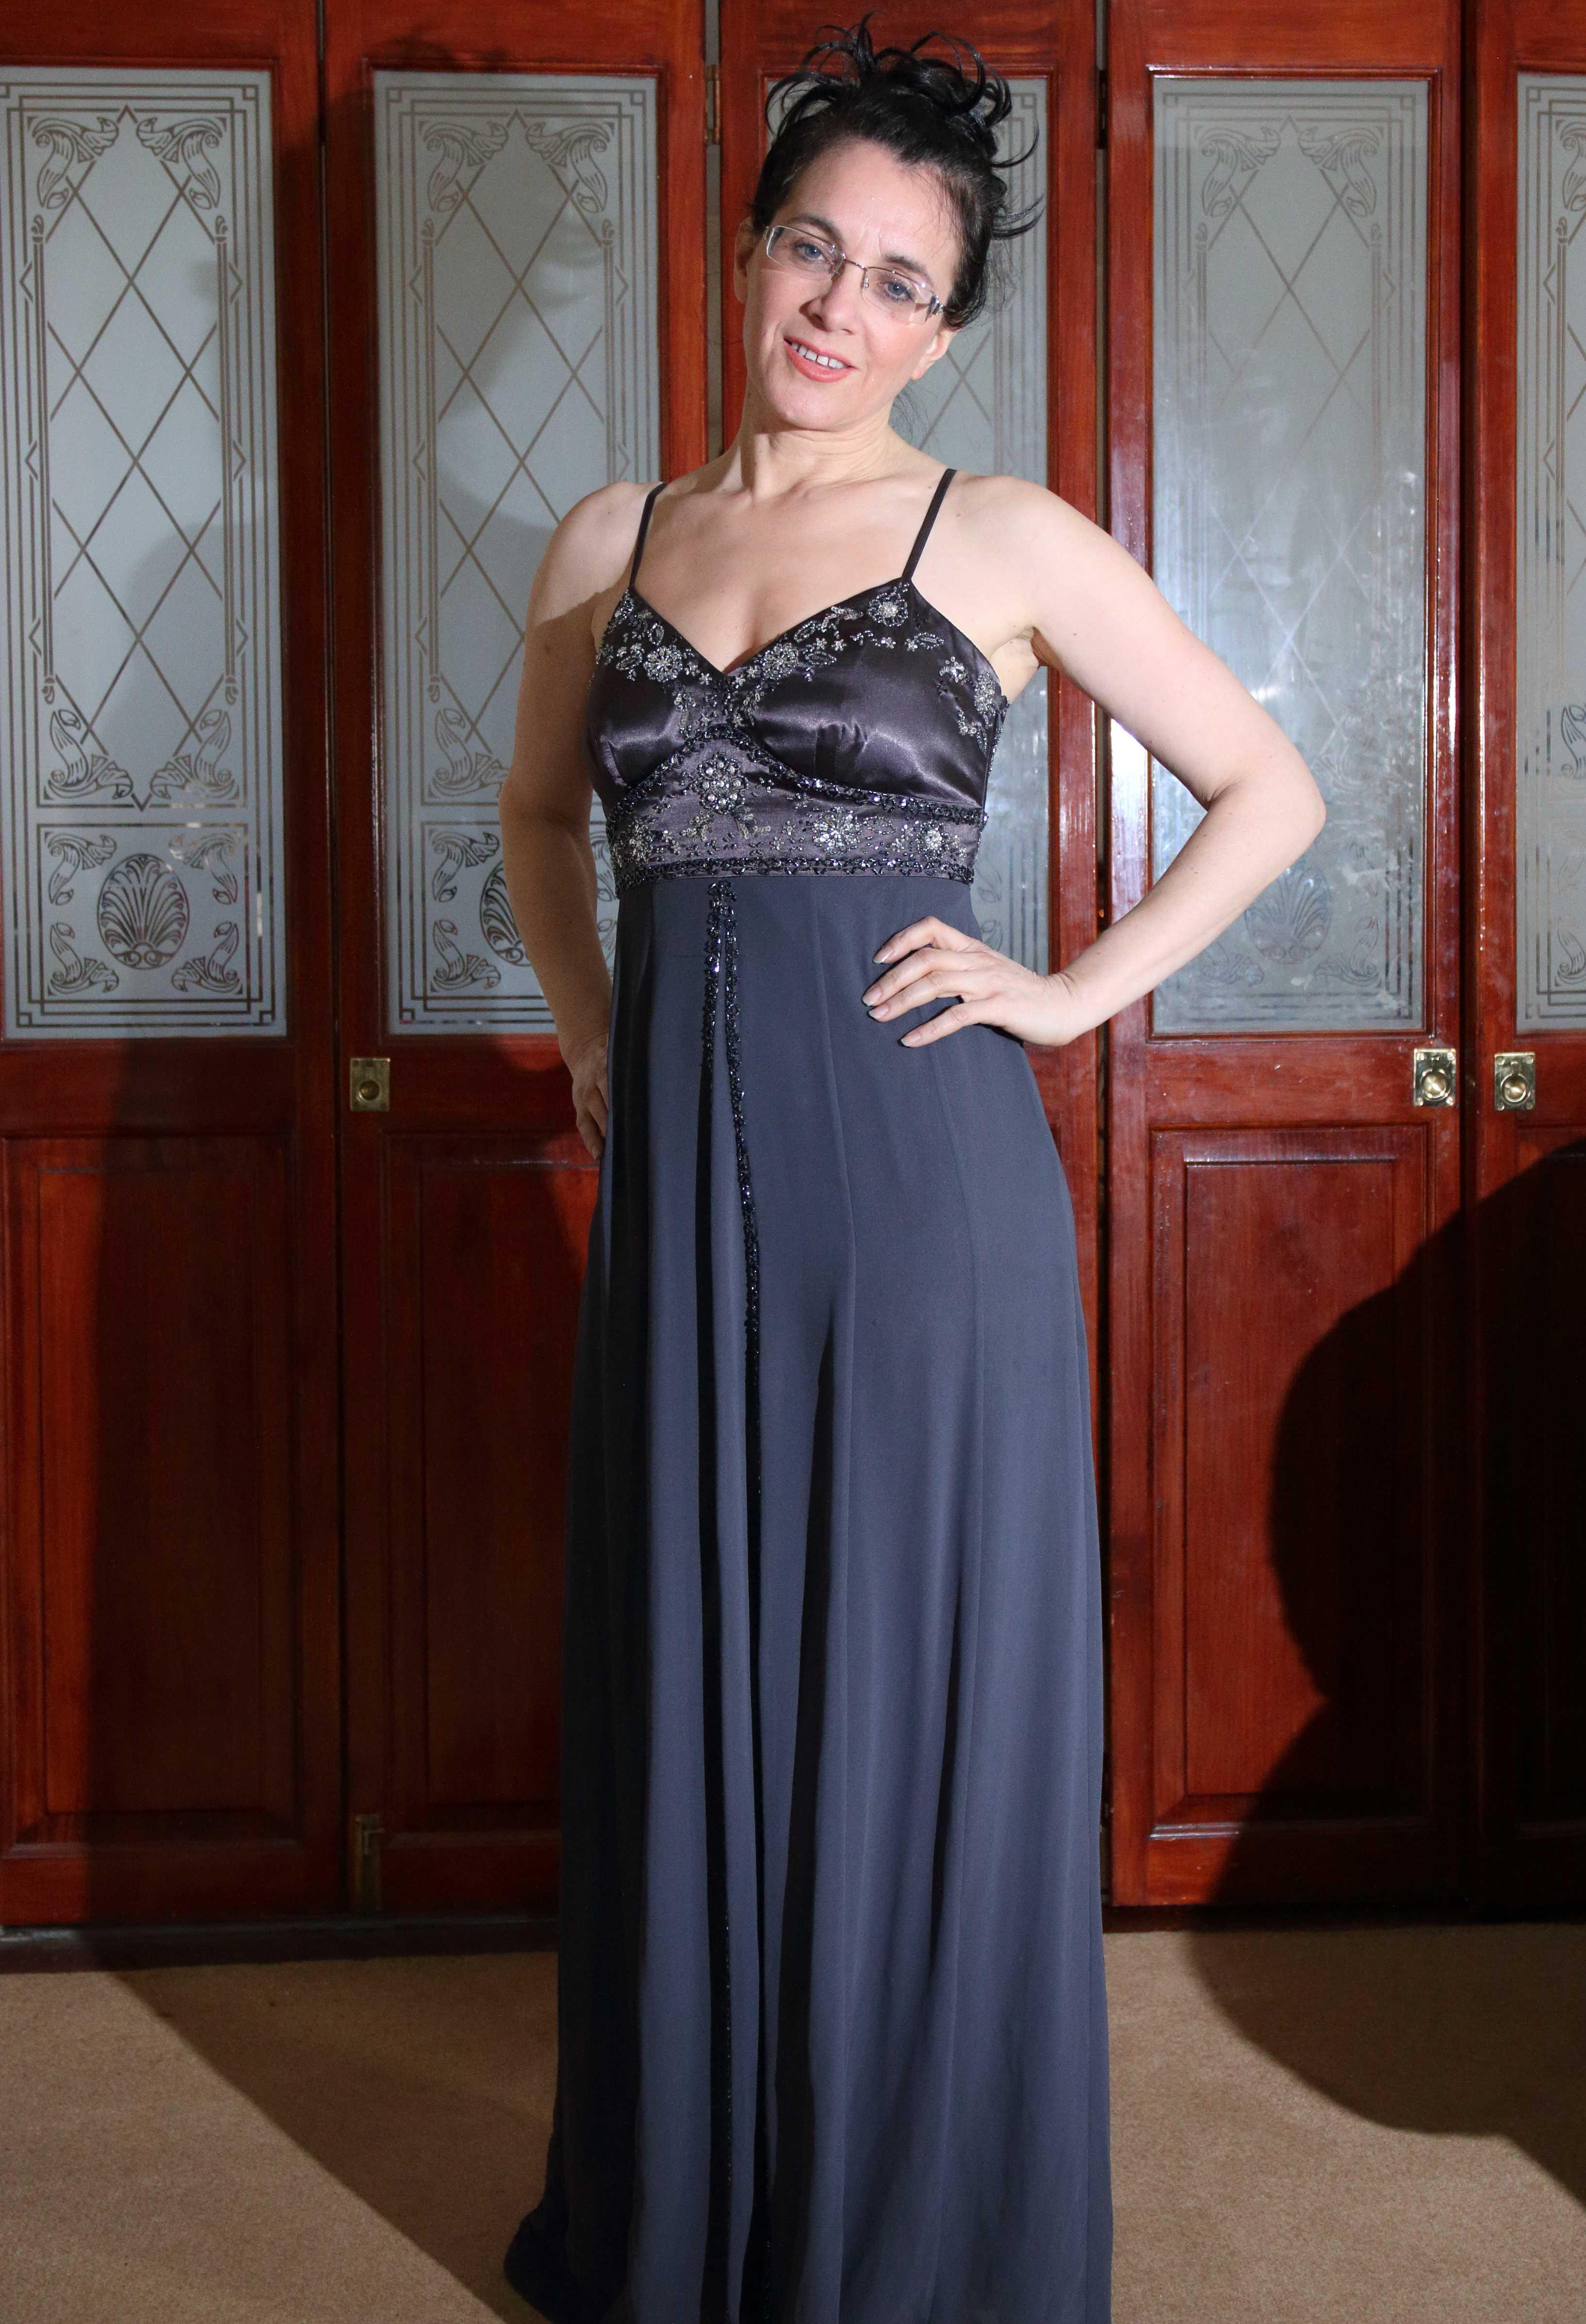 Event Companion photo Debra wearing silver-grey floor-length evening dress